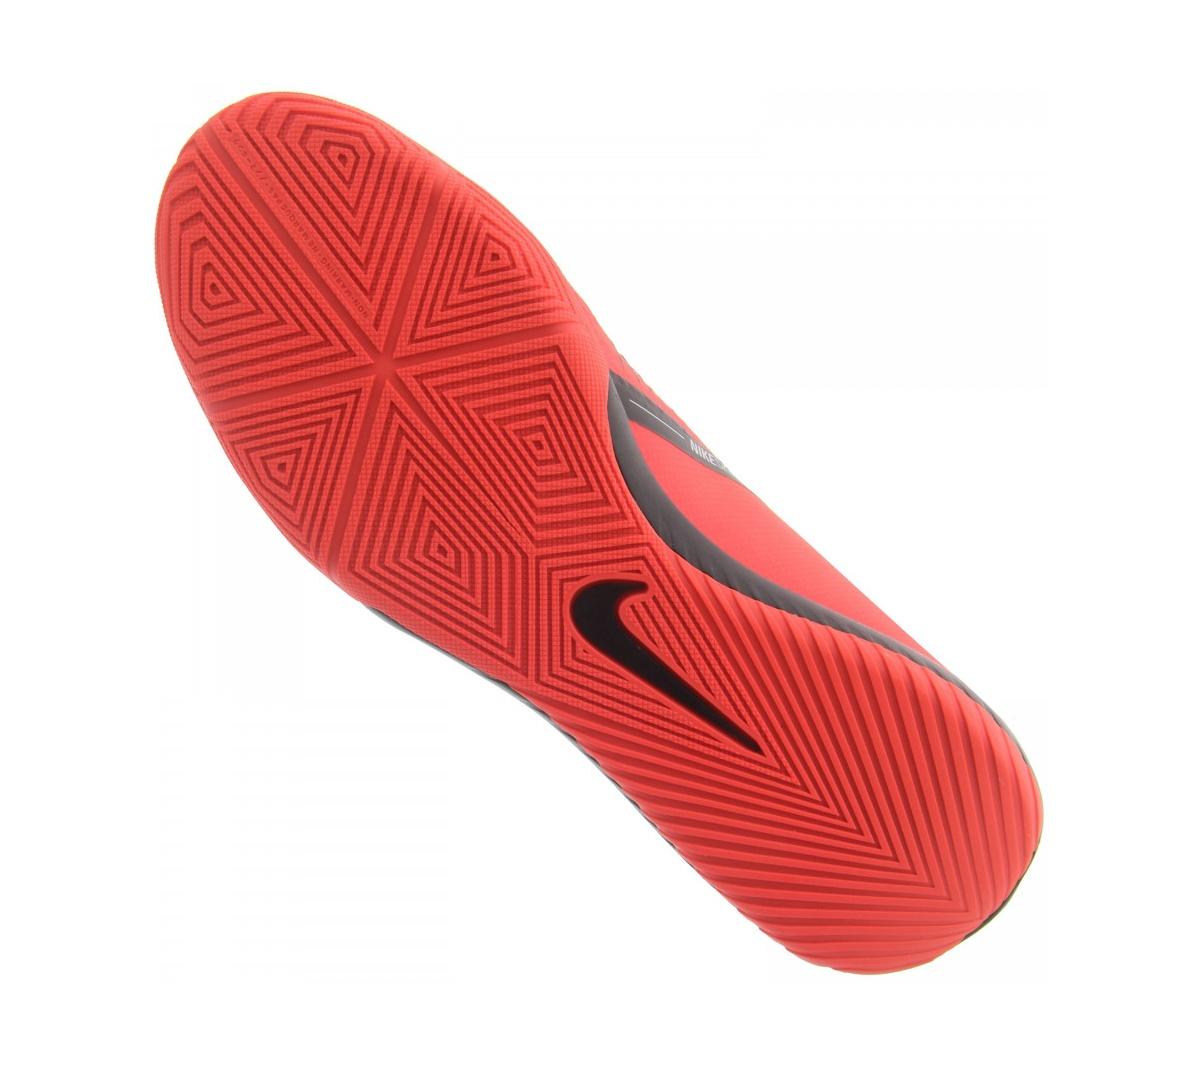 Chuteira Nike Phantom Venom Academy Futsal Adulto